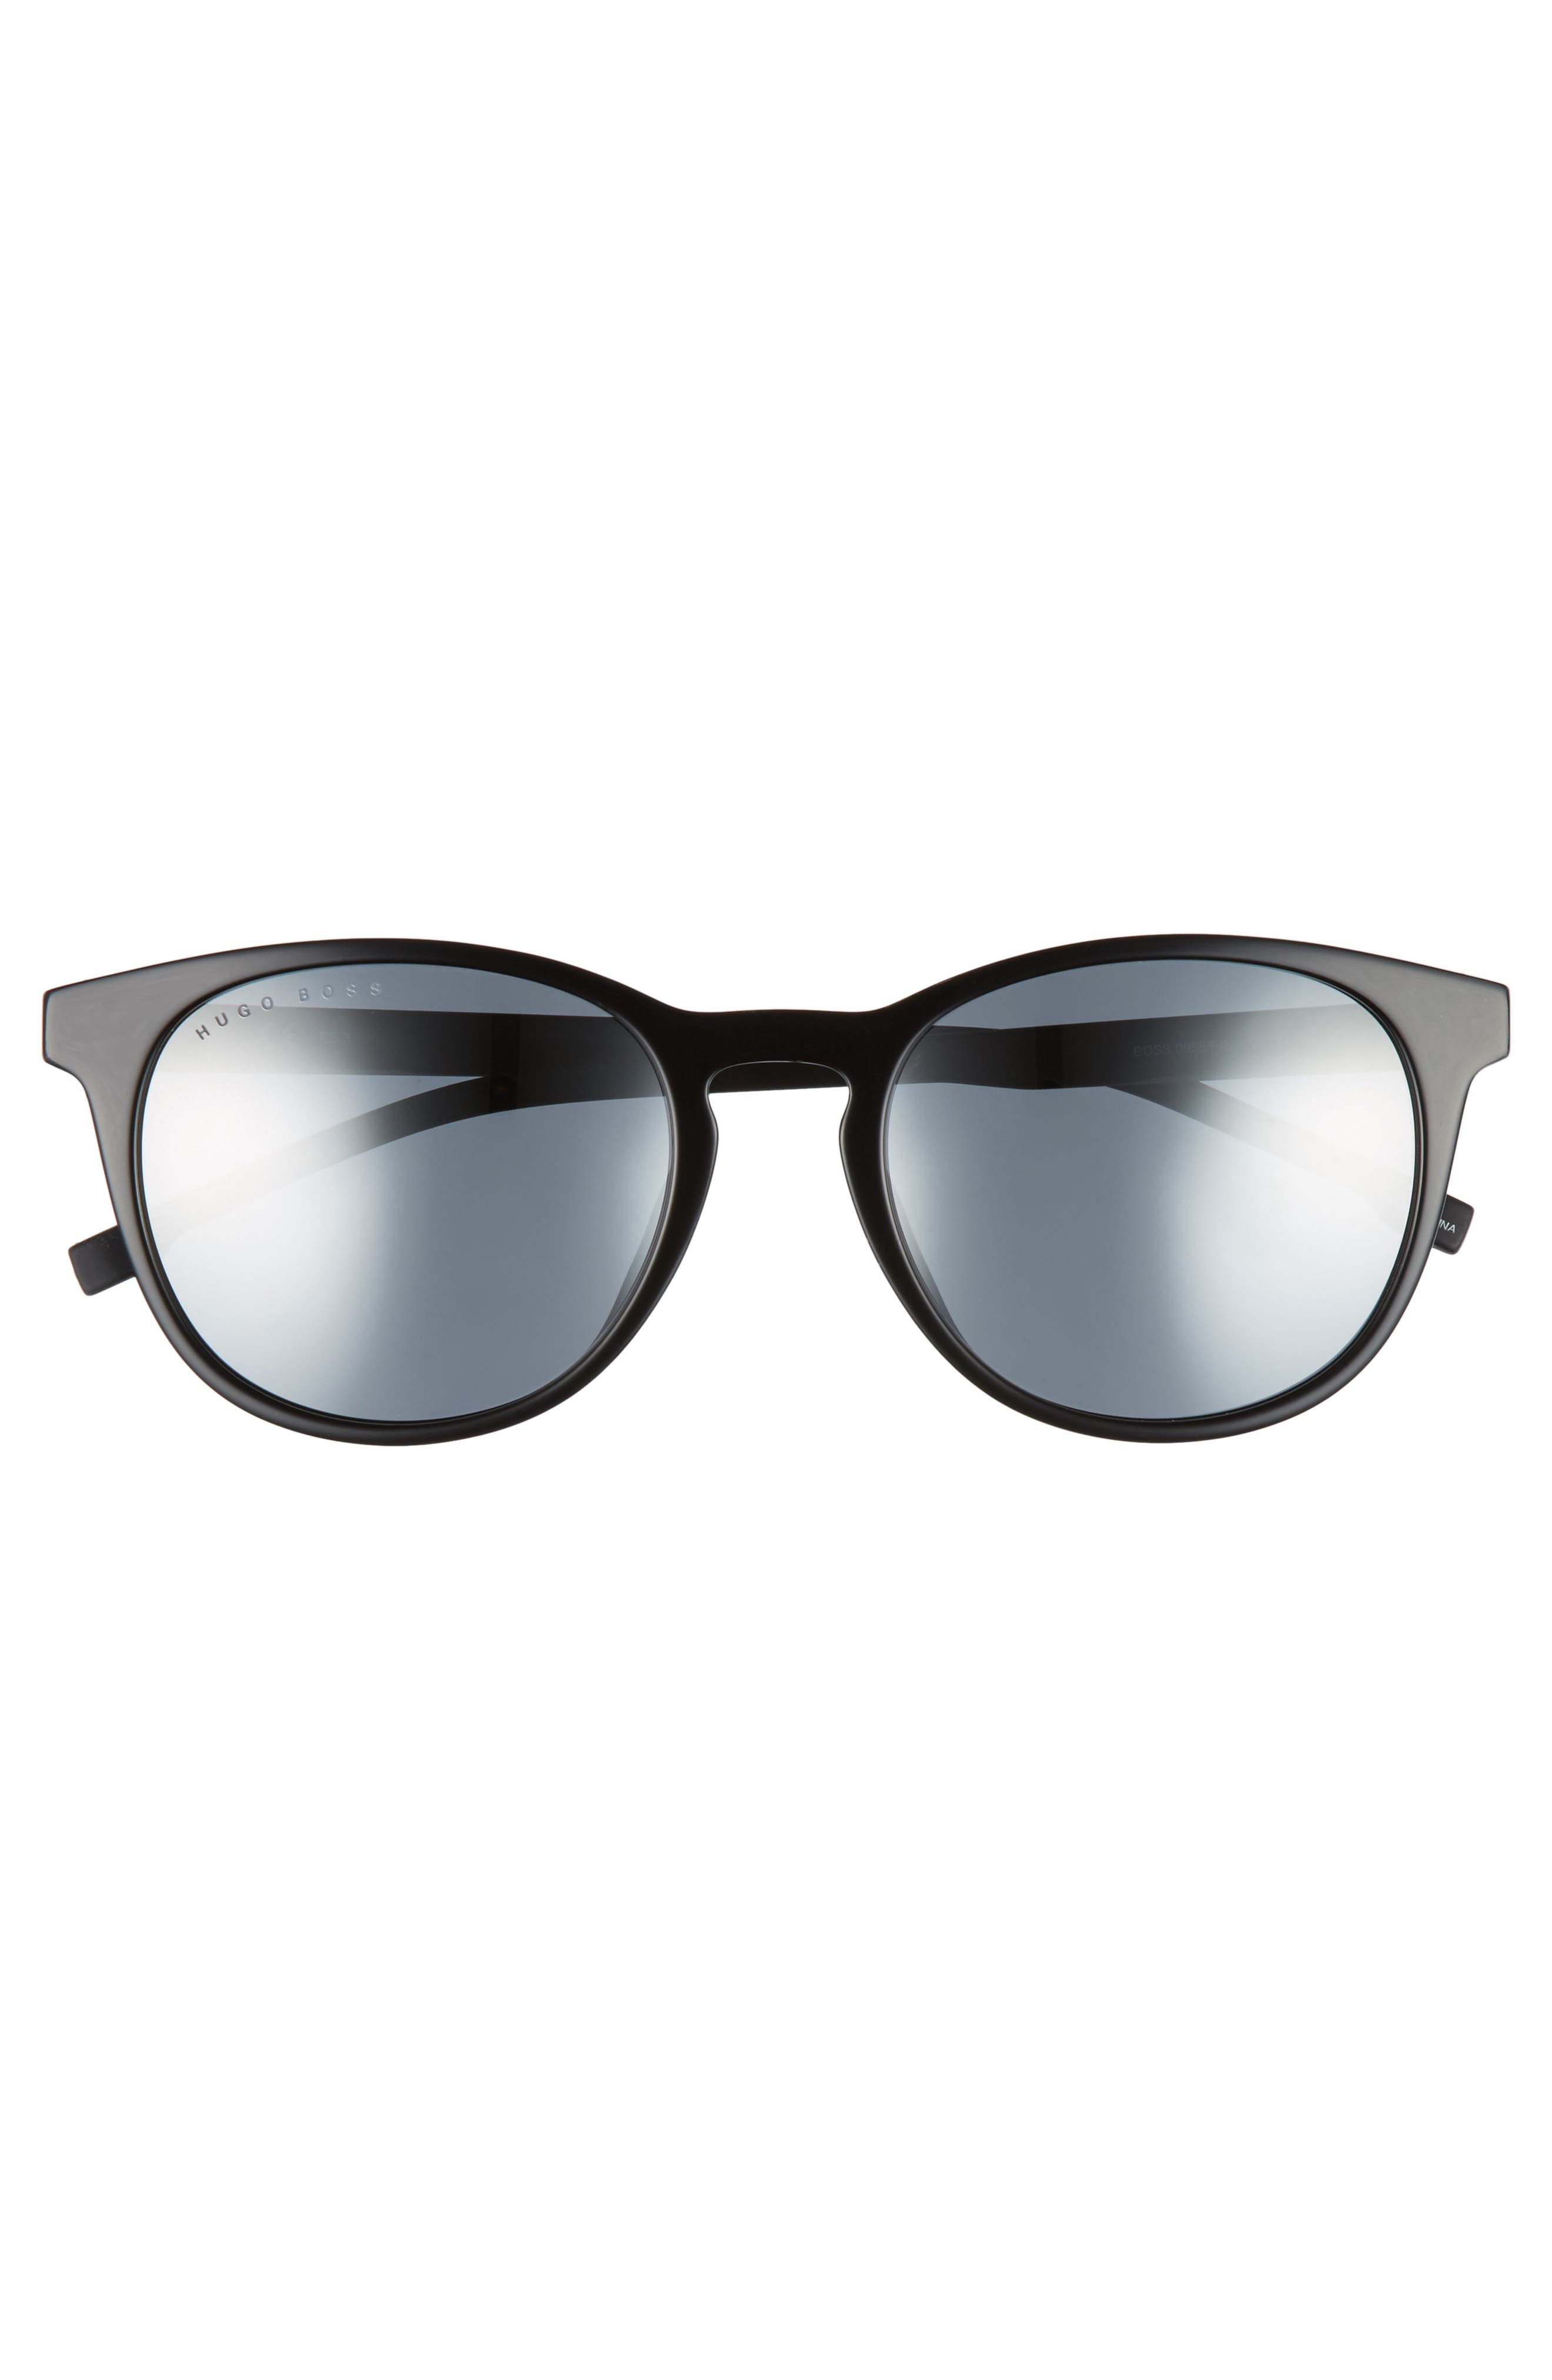 54mm Sunglasses,                             Alternate thumbnail 3, color,